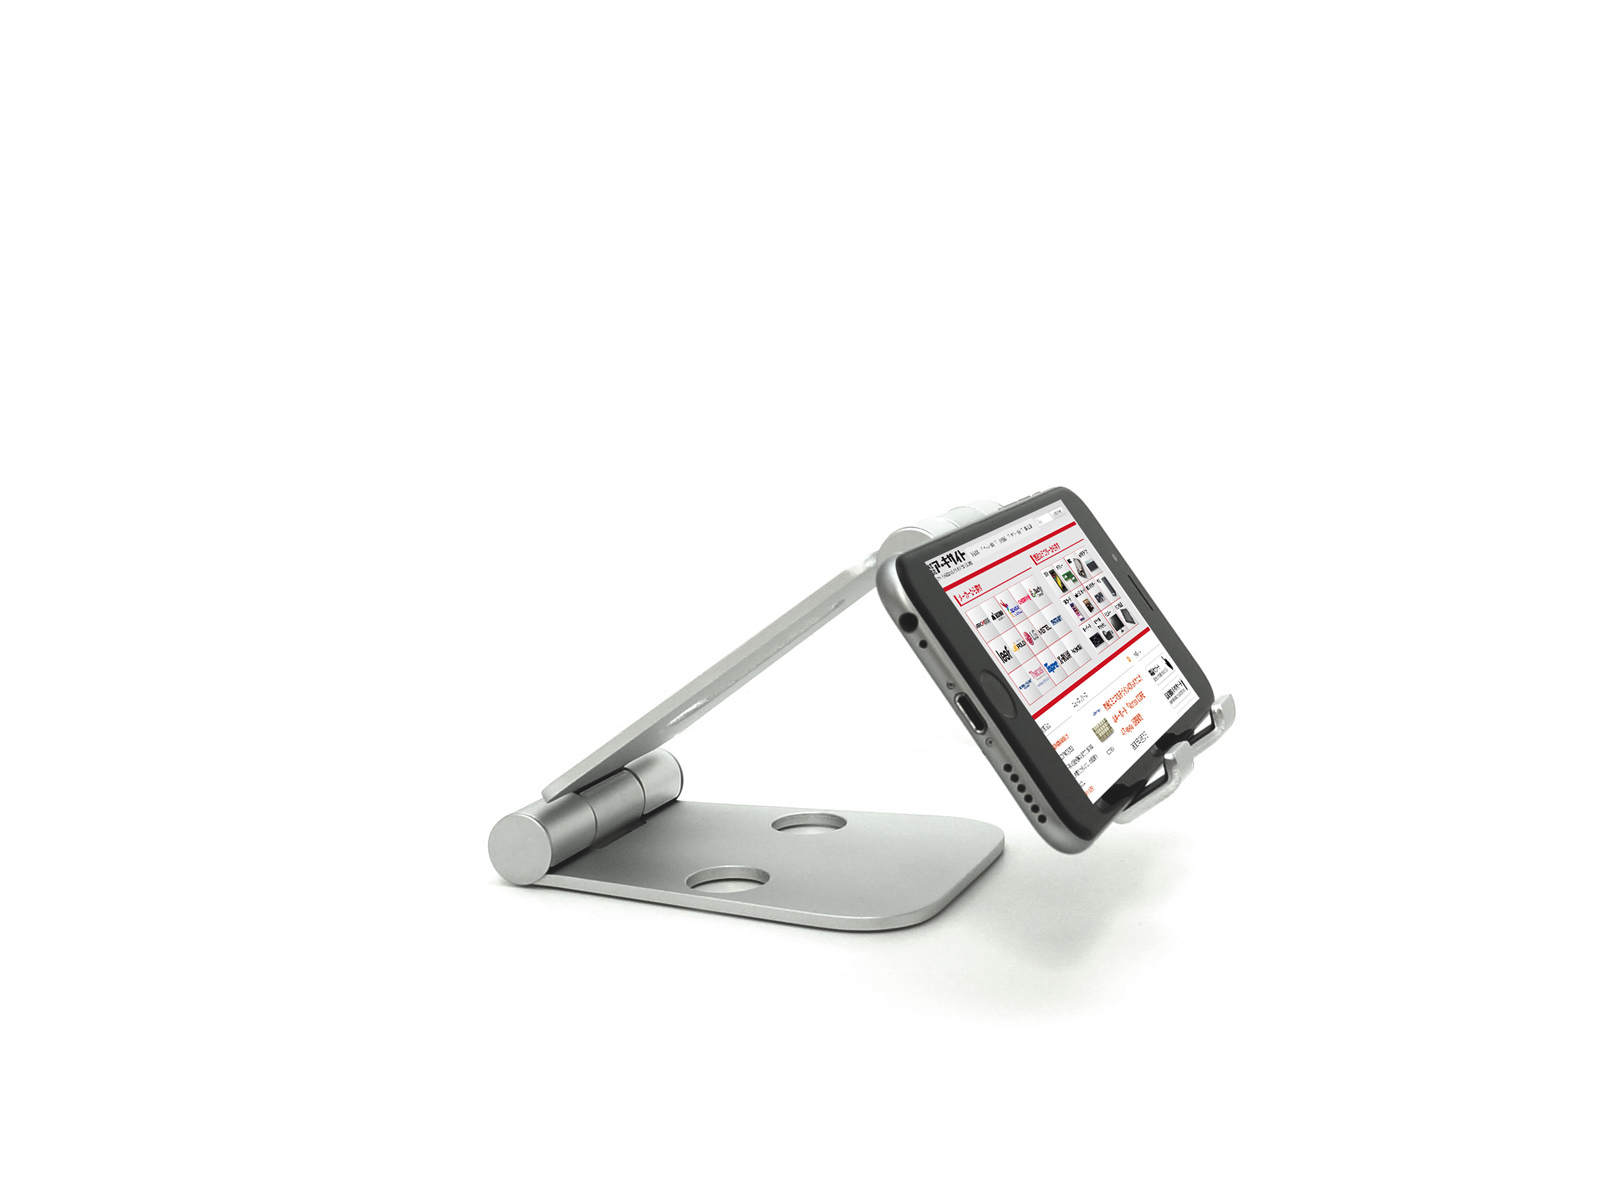 f5d96d9085 スマホやゲーム機に便利!厚さ1.8cmコンパクトに折りたためる角度調整 ...